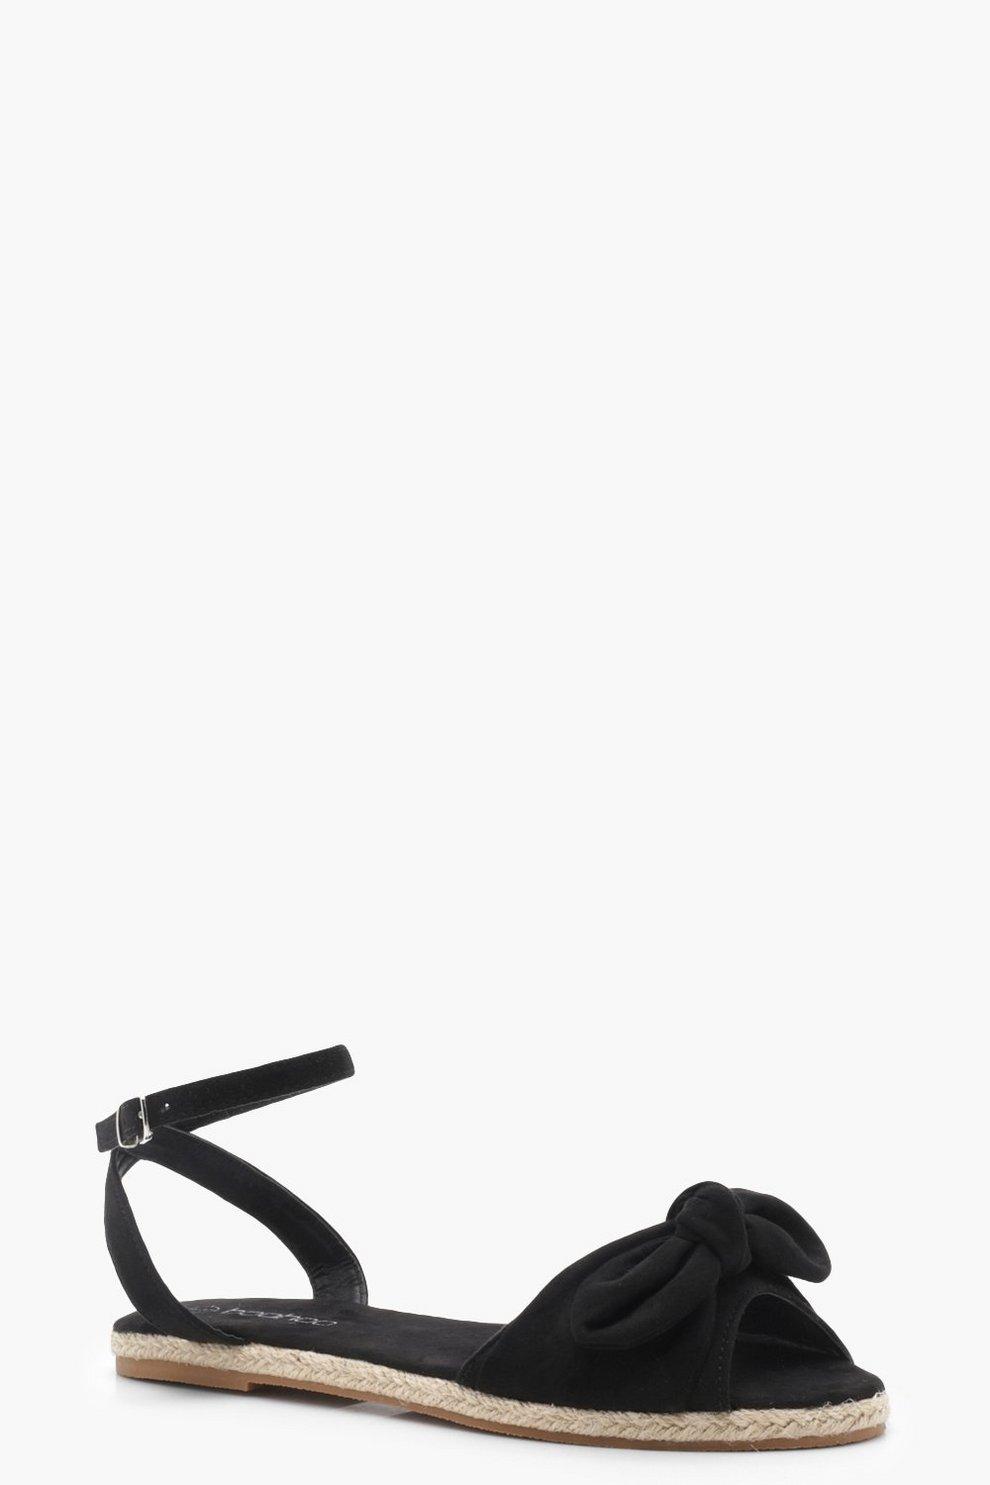 ddc22f591b7a Espadrille Bow Detail Sandals